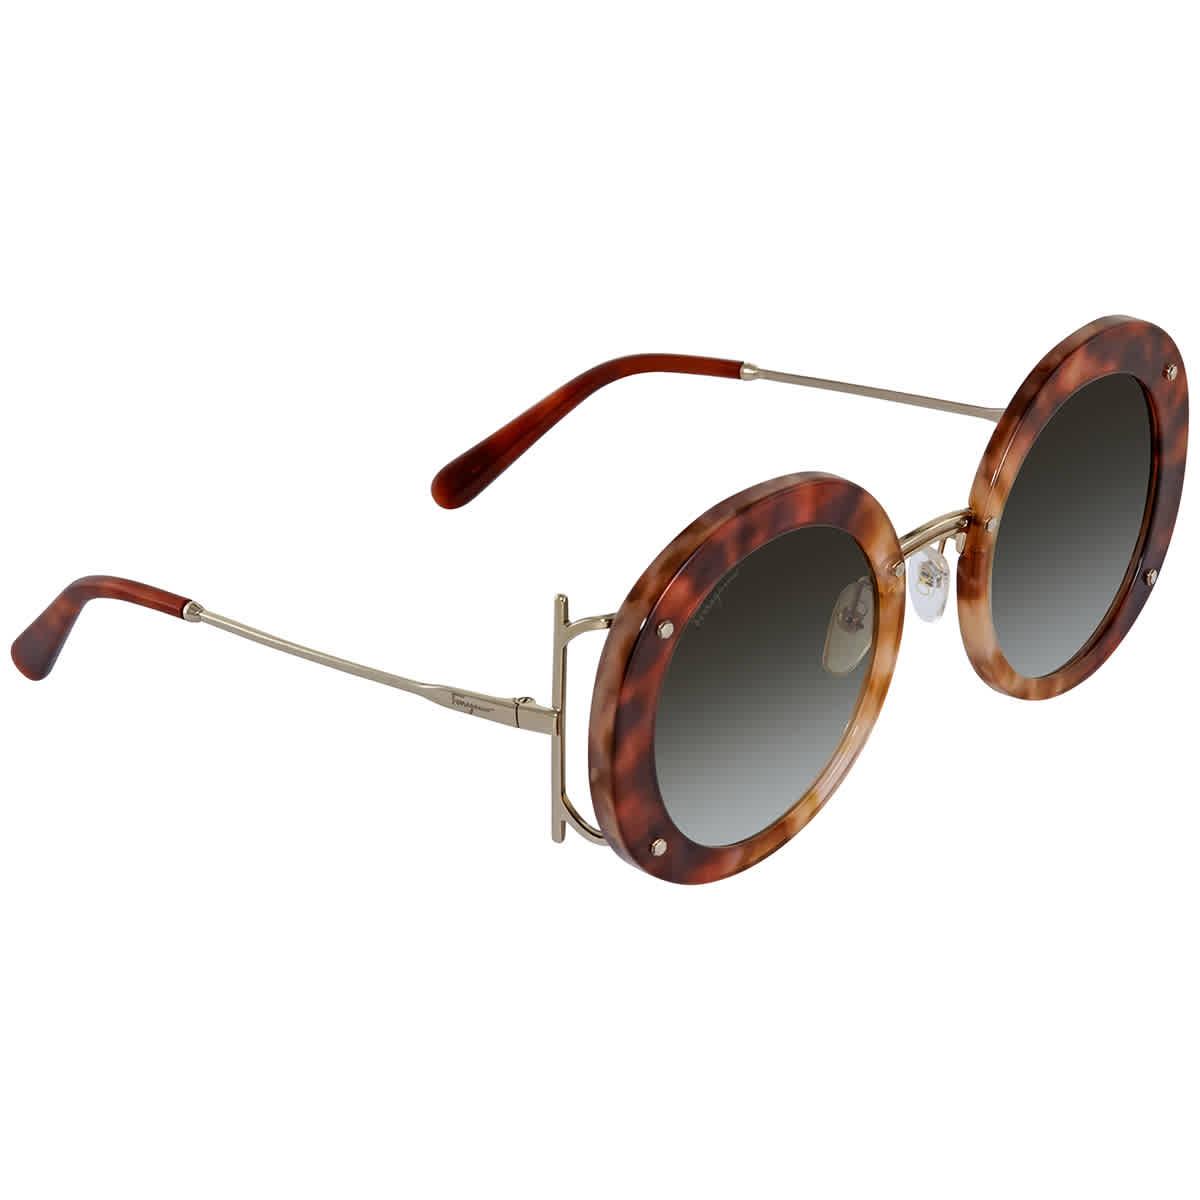 Salvatore Ferragamo Grey Gradient Round Ladies Sunglasses Sf939s 232 52 In Brown